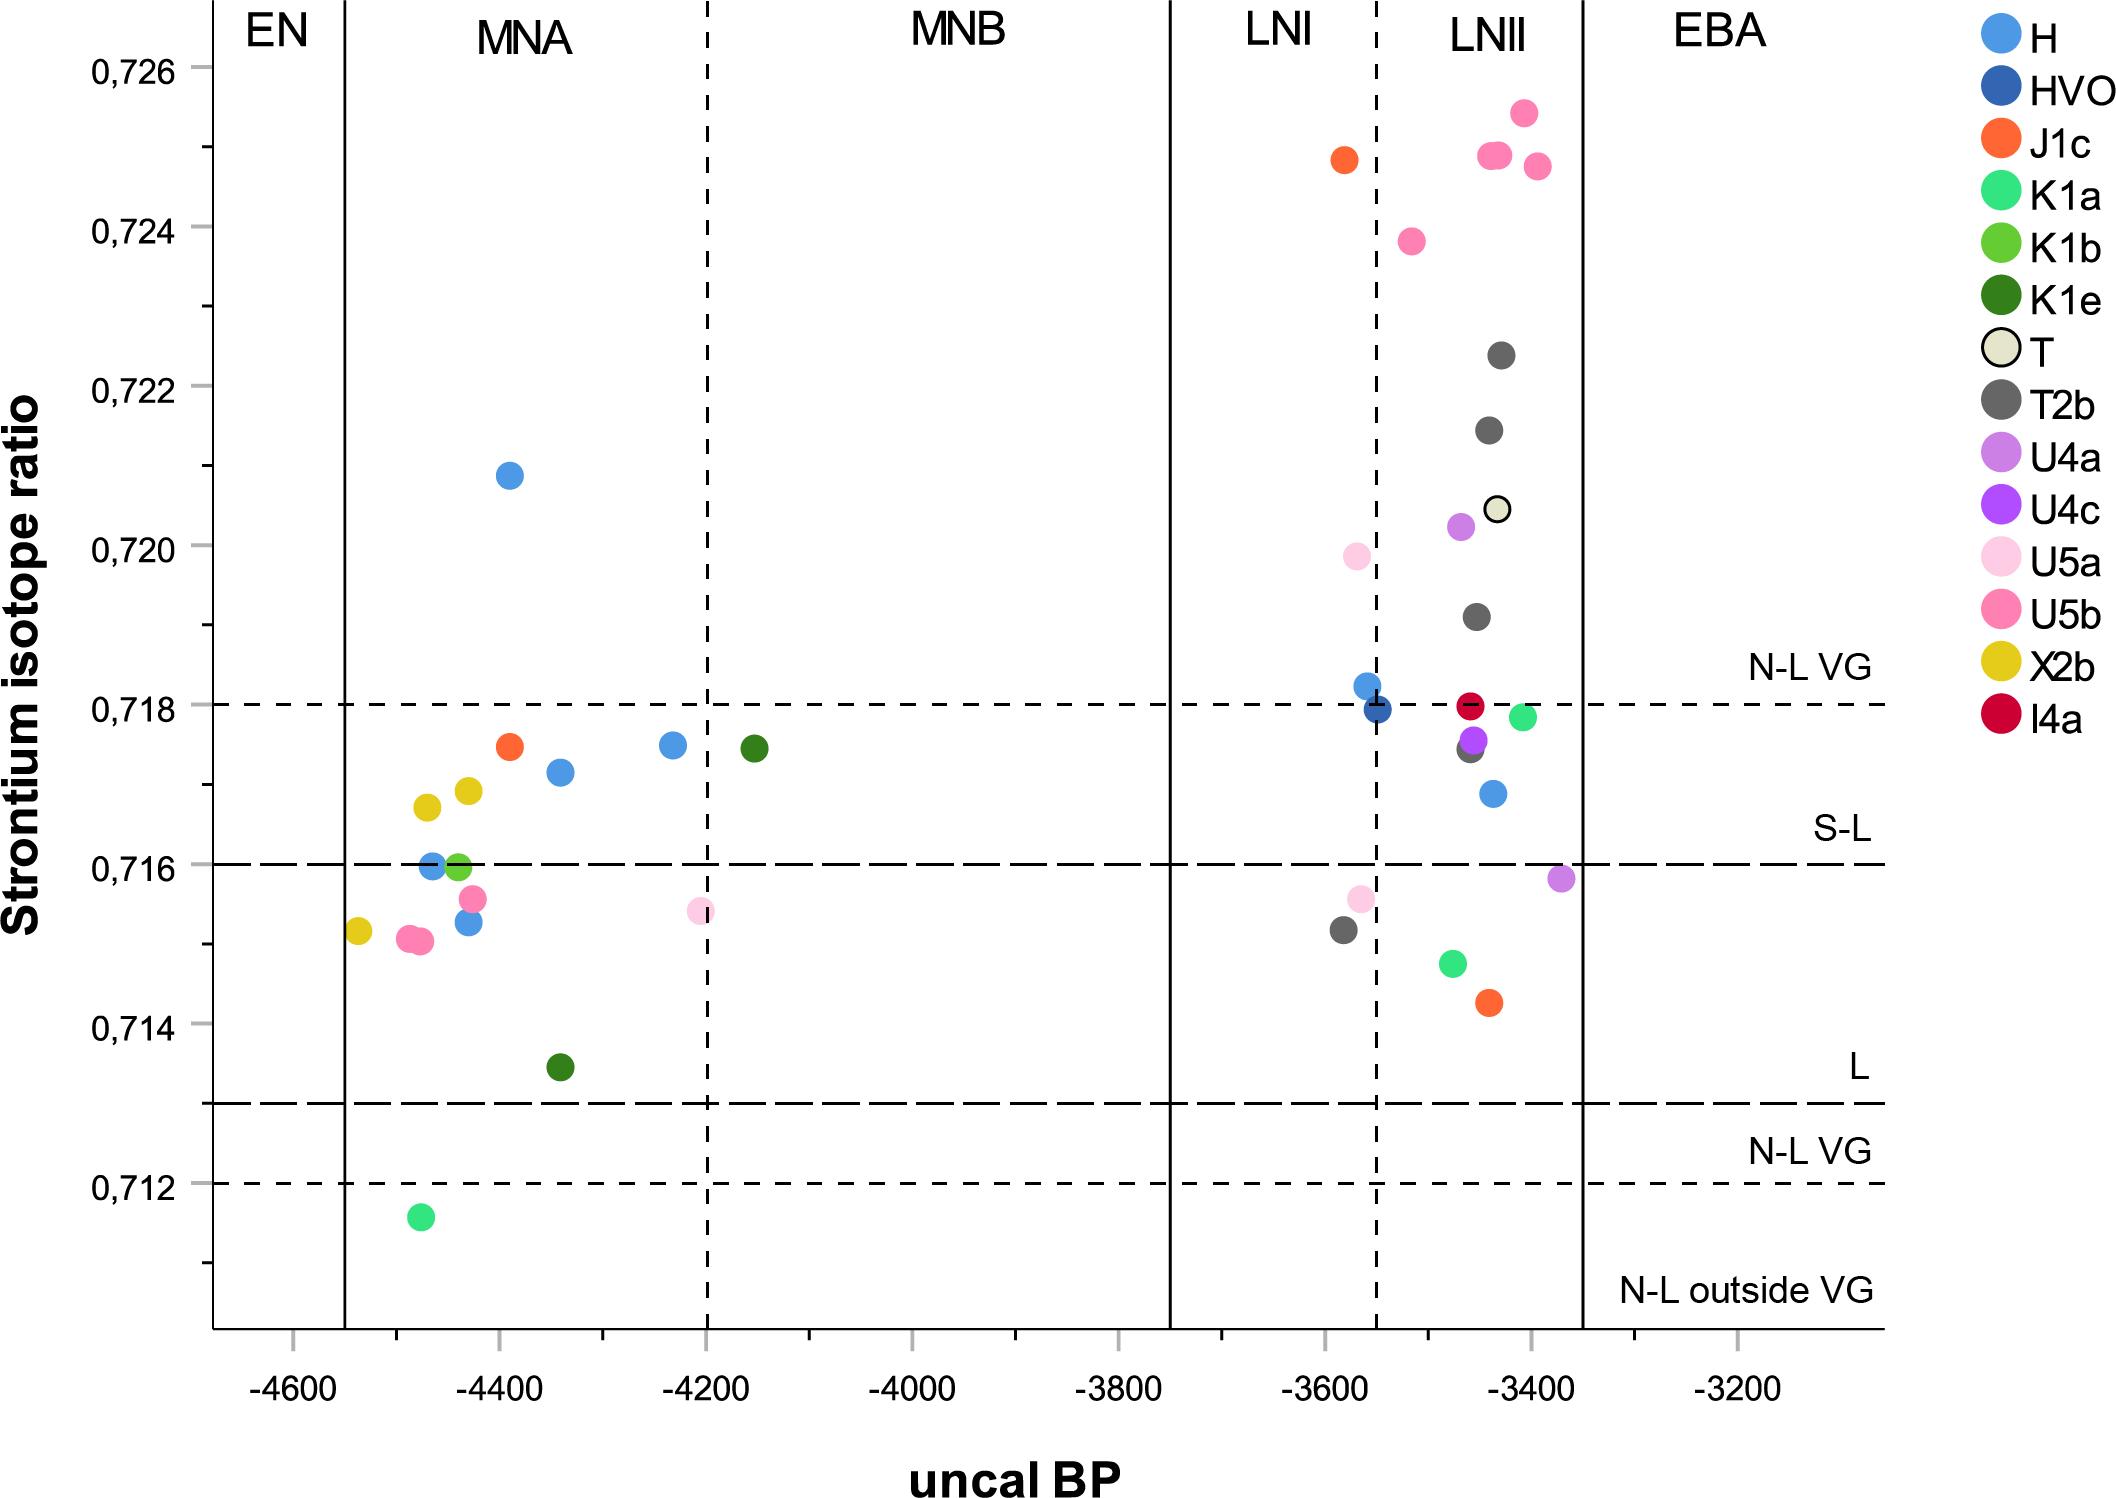 mtdna-haplogroup-ratio-vastergotland